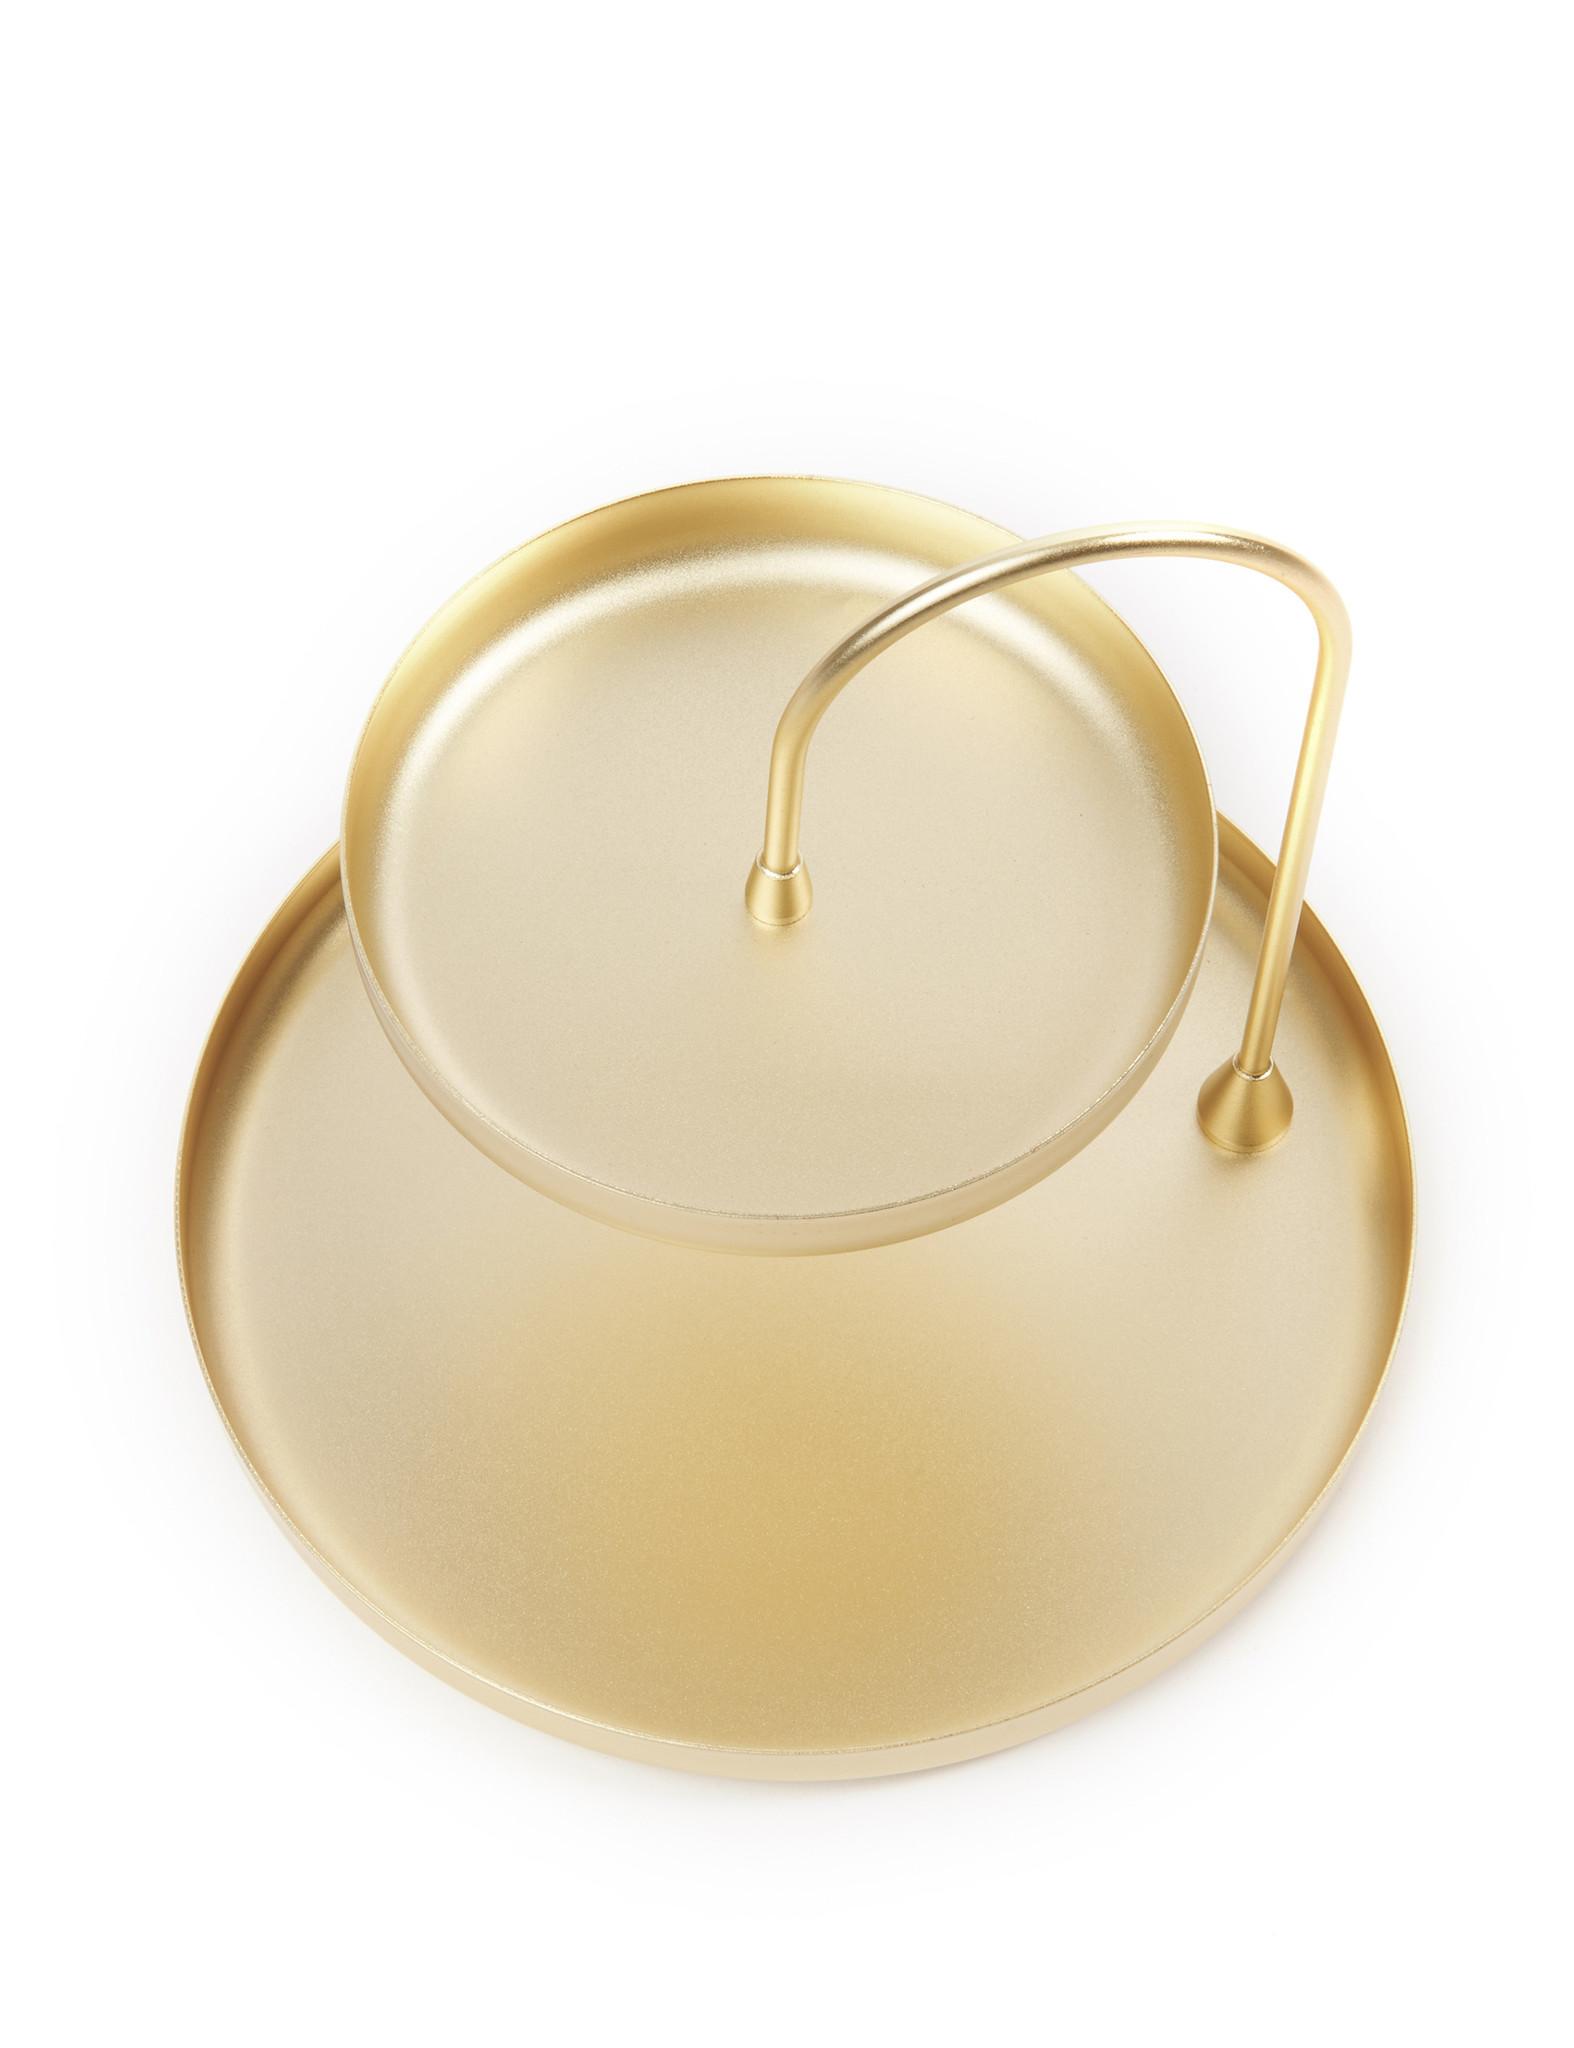 Gouden accessoirehouder 'Poise' van Umbra